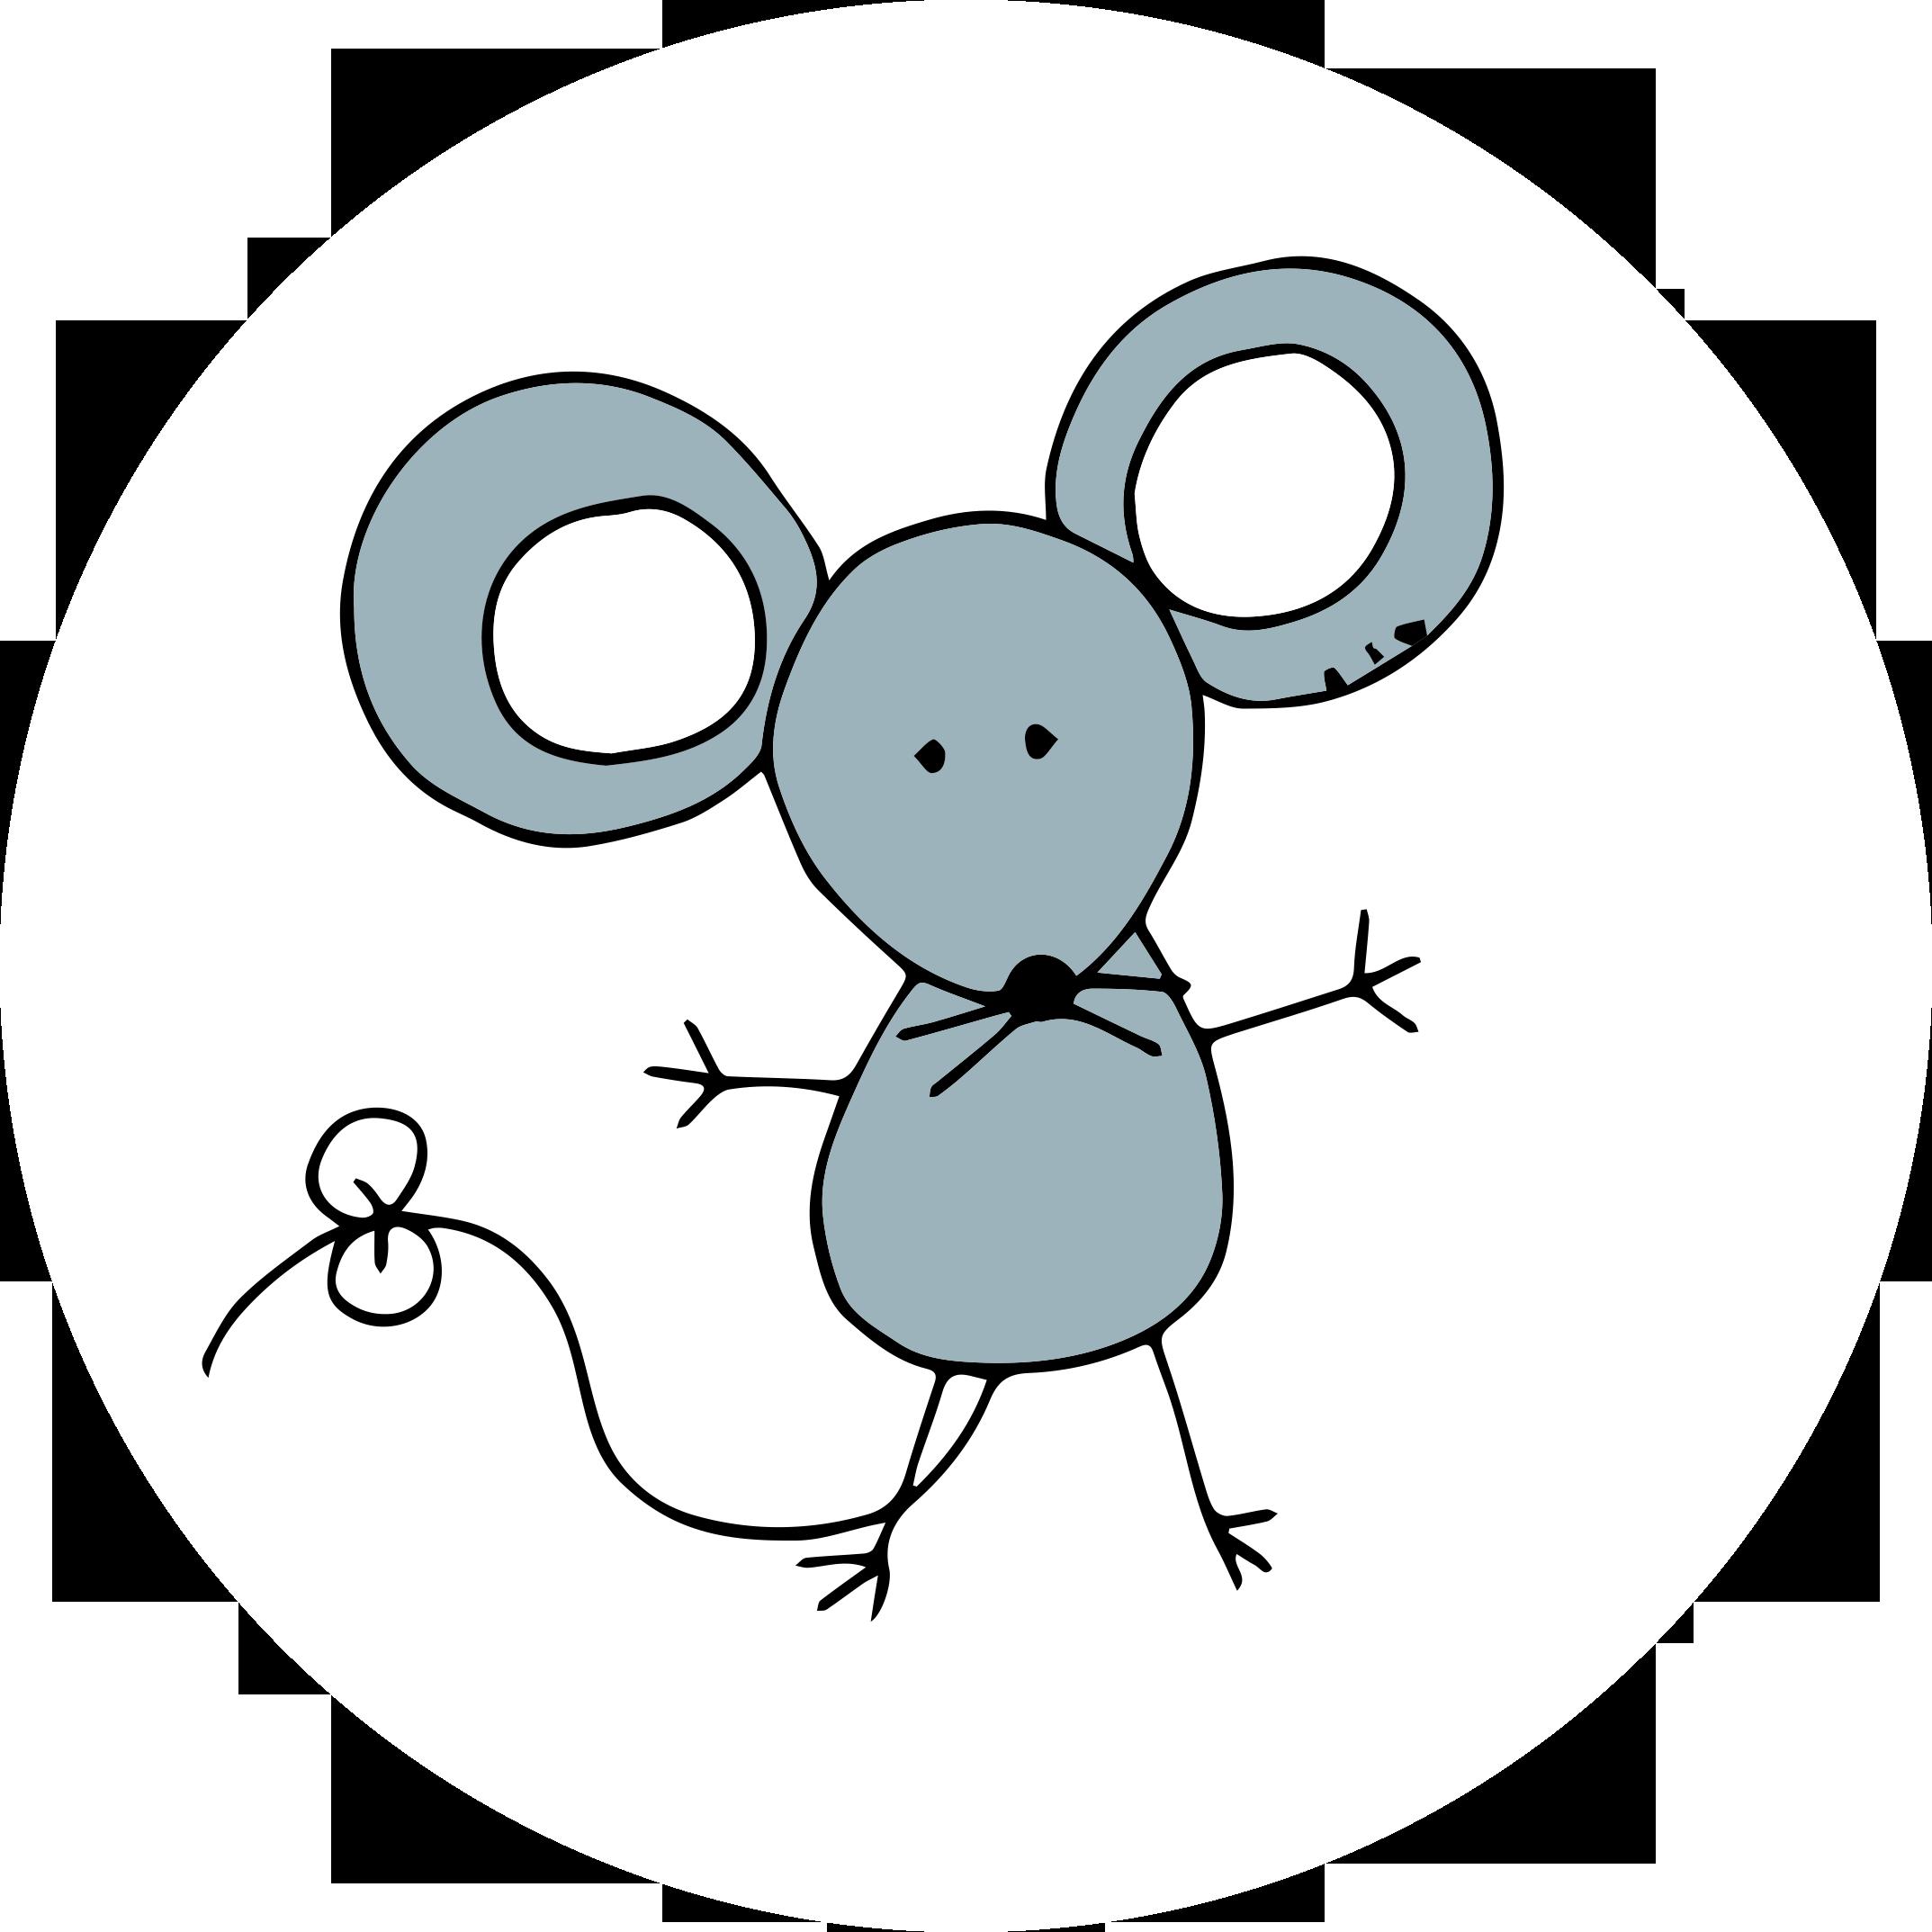 Pest control service experts. Rat clipart leptospirosis